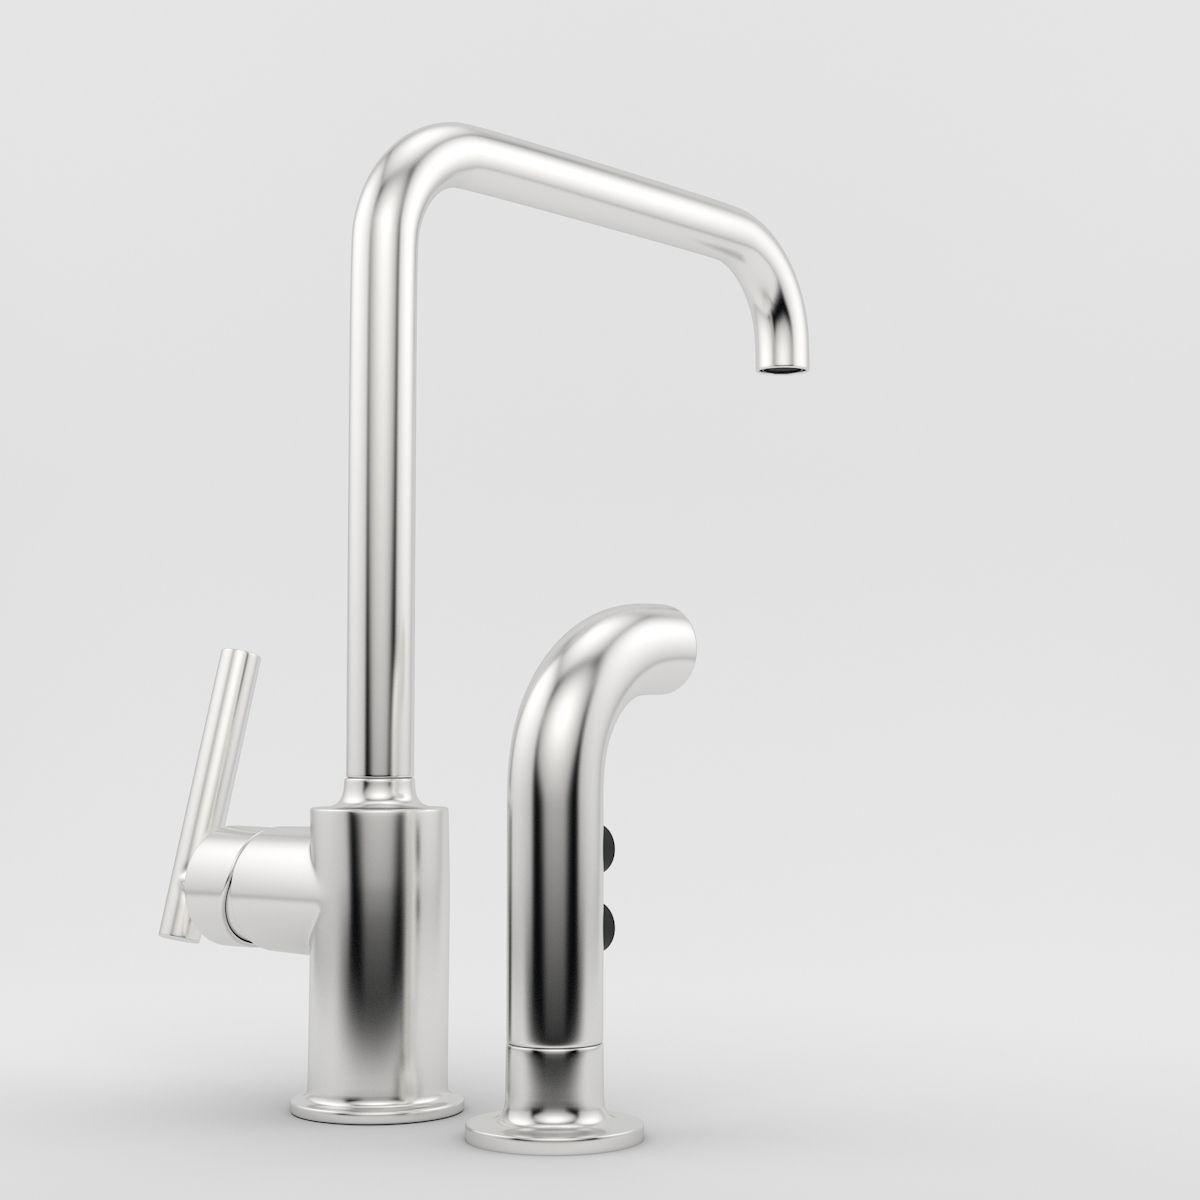 Kohler Purist Sink : 197 0 description comments 0 kohler purist 3d model kohler pourist ...